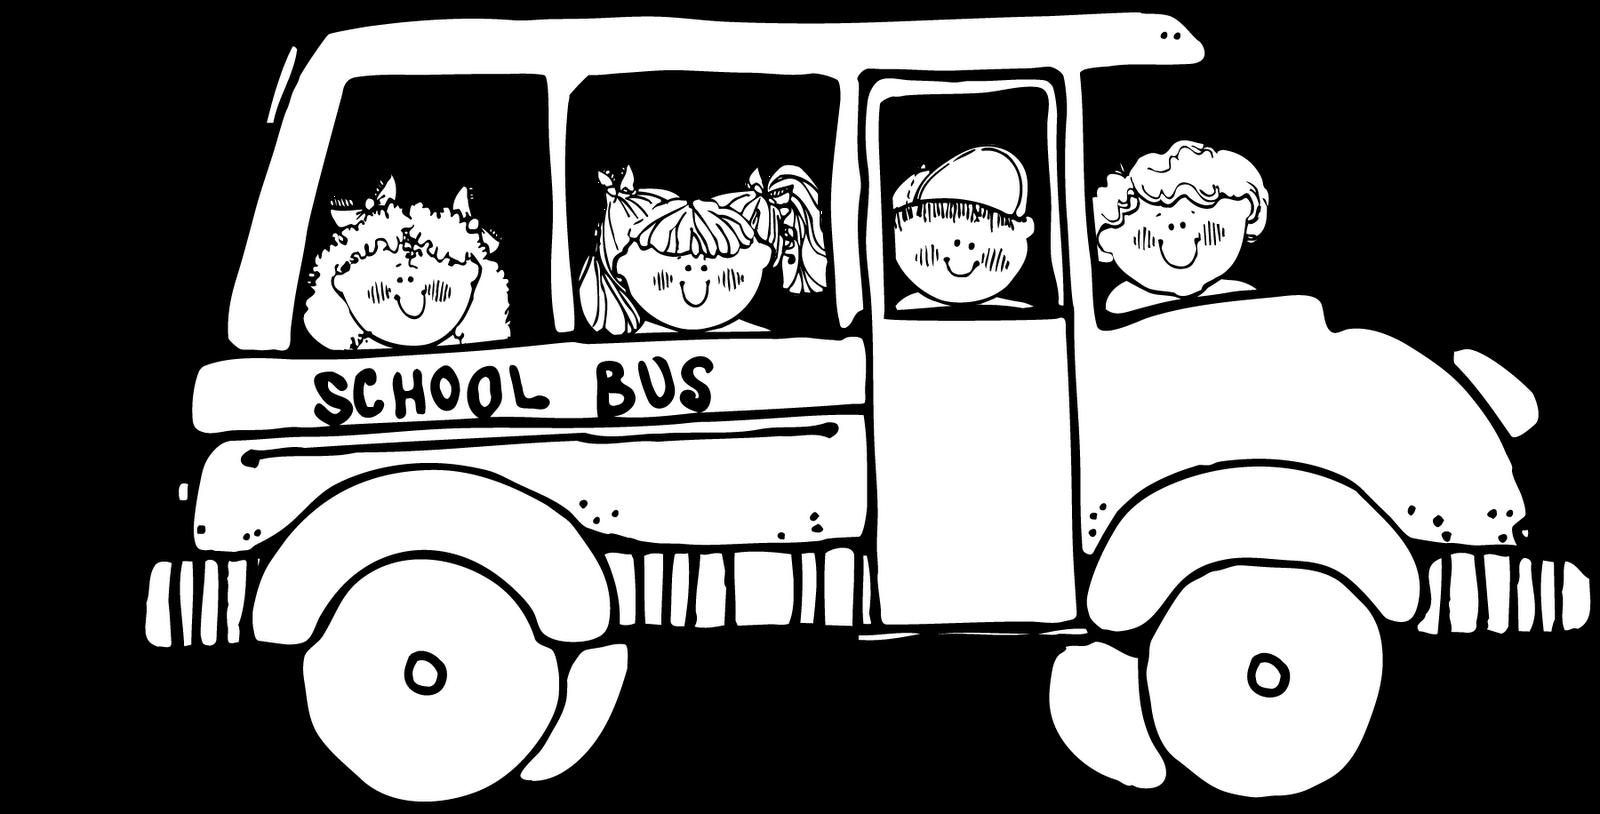 school bus image black and white mrs ayala s kinder fun national rh pinterest com Car Clip Art Black and White Yellow School Bus Clip Art